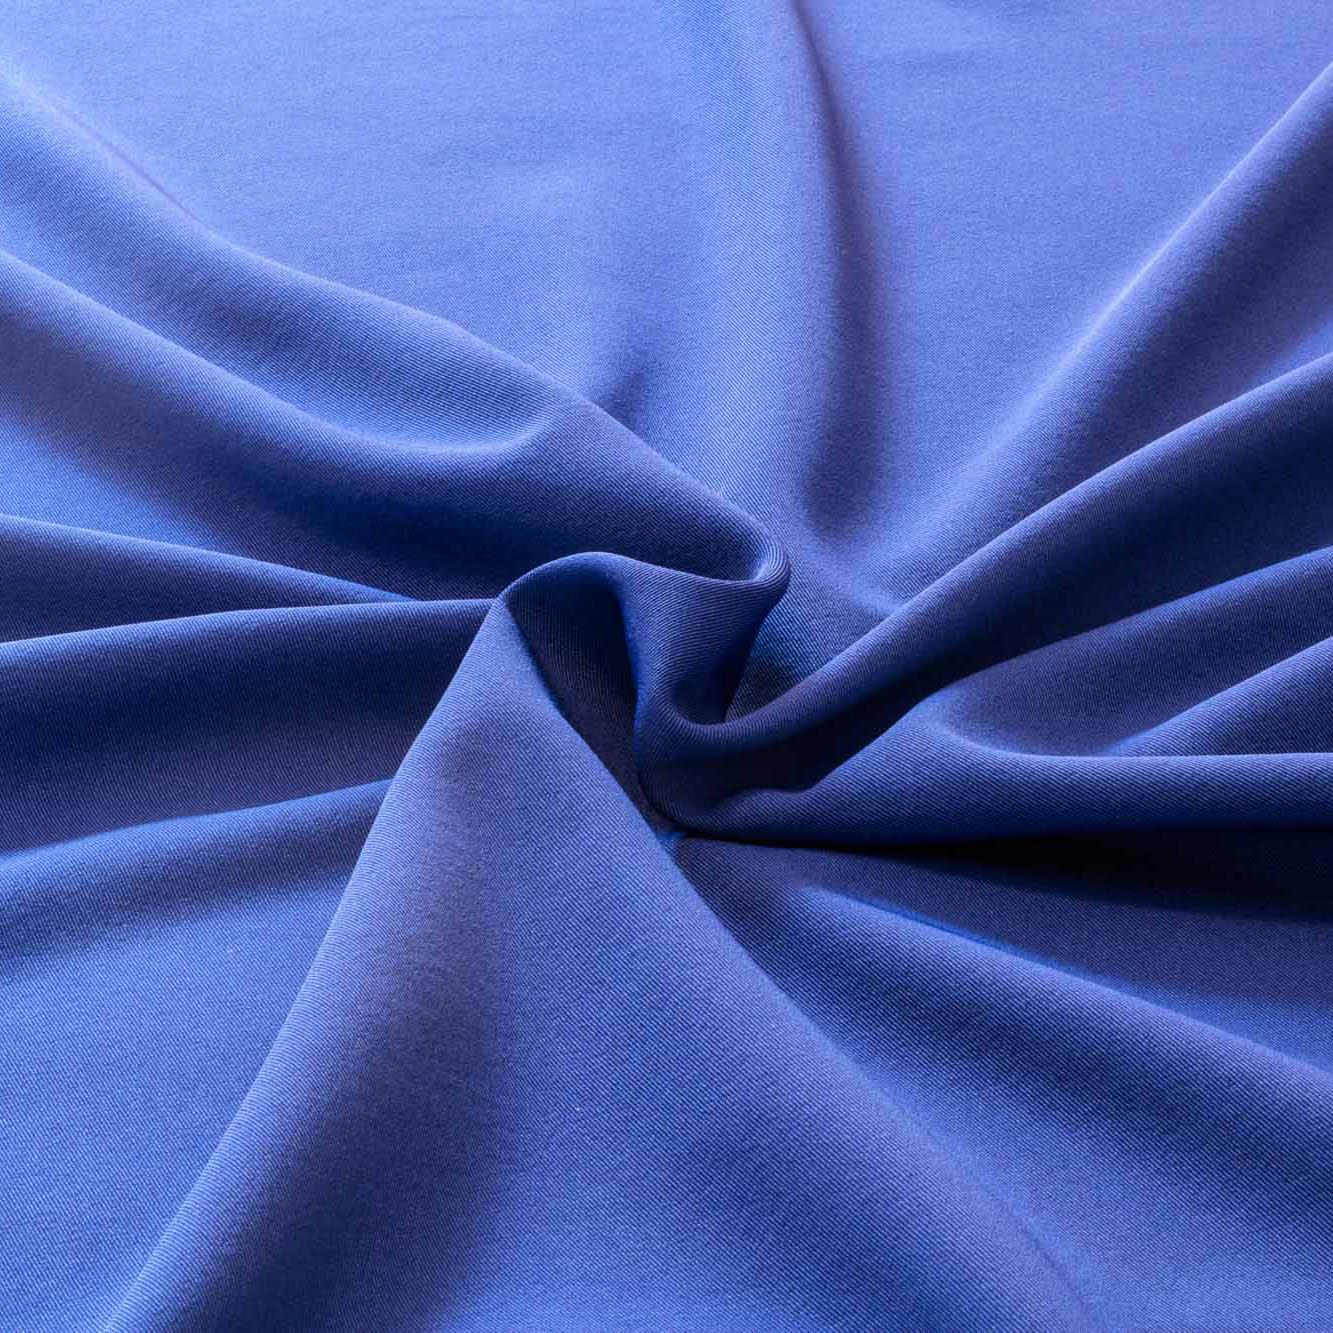 Tecido Gabardine Two Way Azul Royal 96% Poliester 4% Elastano 1,50 m Largura